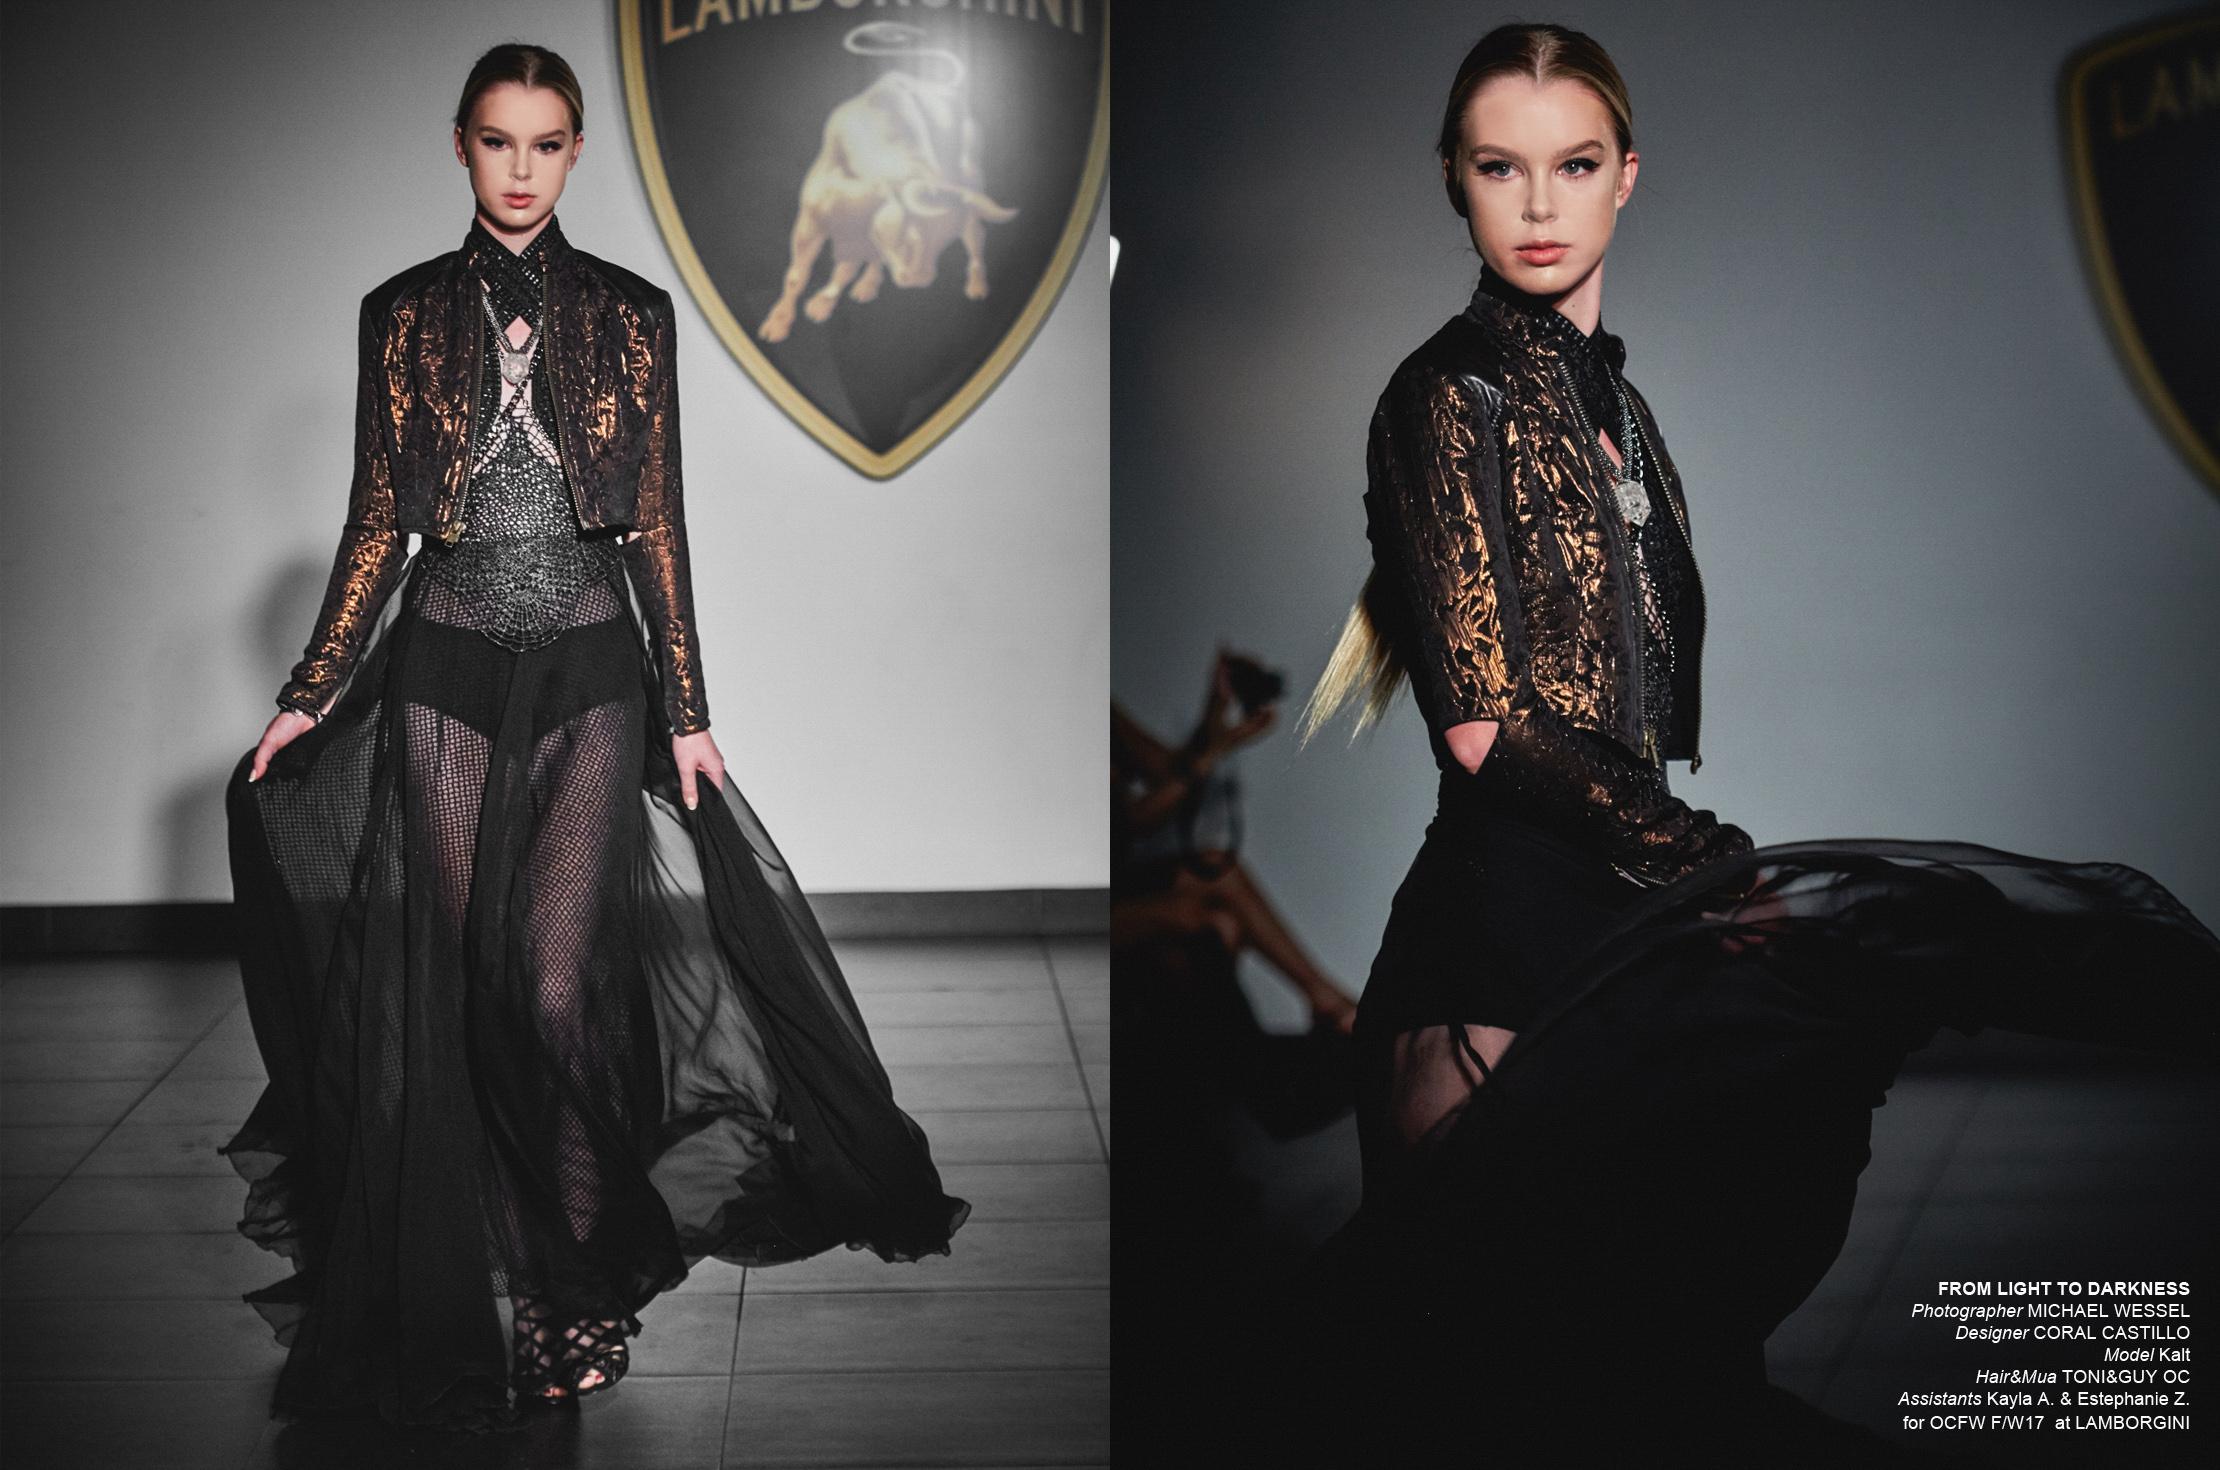 Coral Castillo - OC Fashion Week March 2017 - Photos by Michael Wessel & cREAtive Castle Studios (www.creativecastlestudios.com-Coral-Castillo and www.creativecastlestudios.com-michael-wessel)-4.jpg